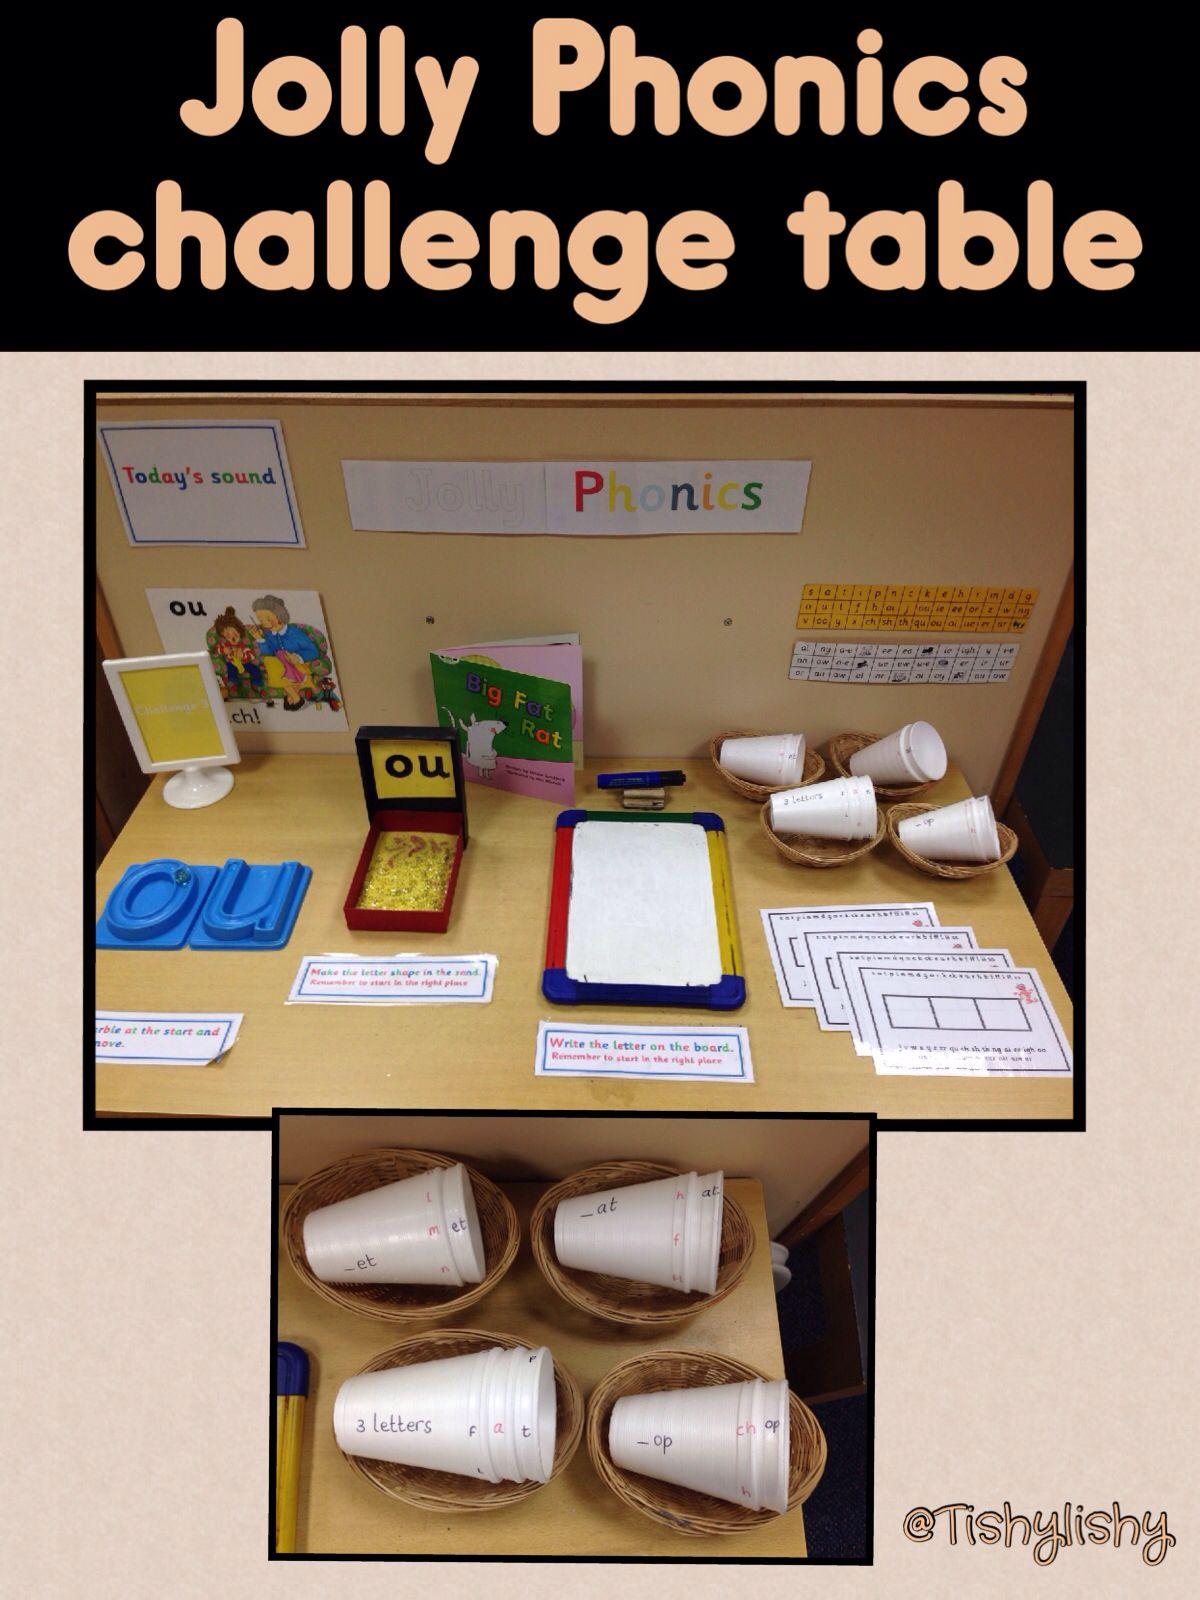 Jolly Phonics Challenge Table